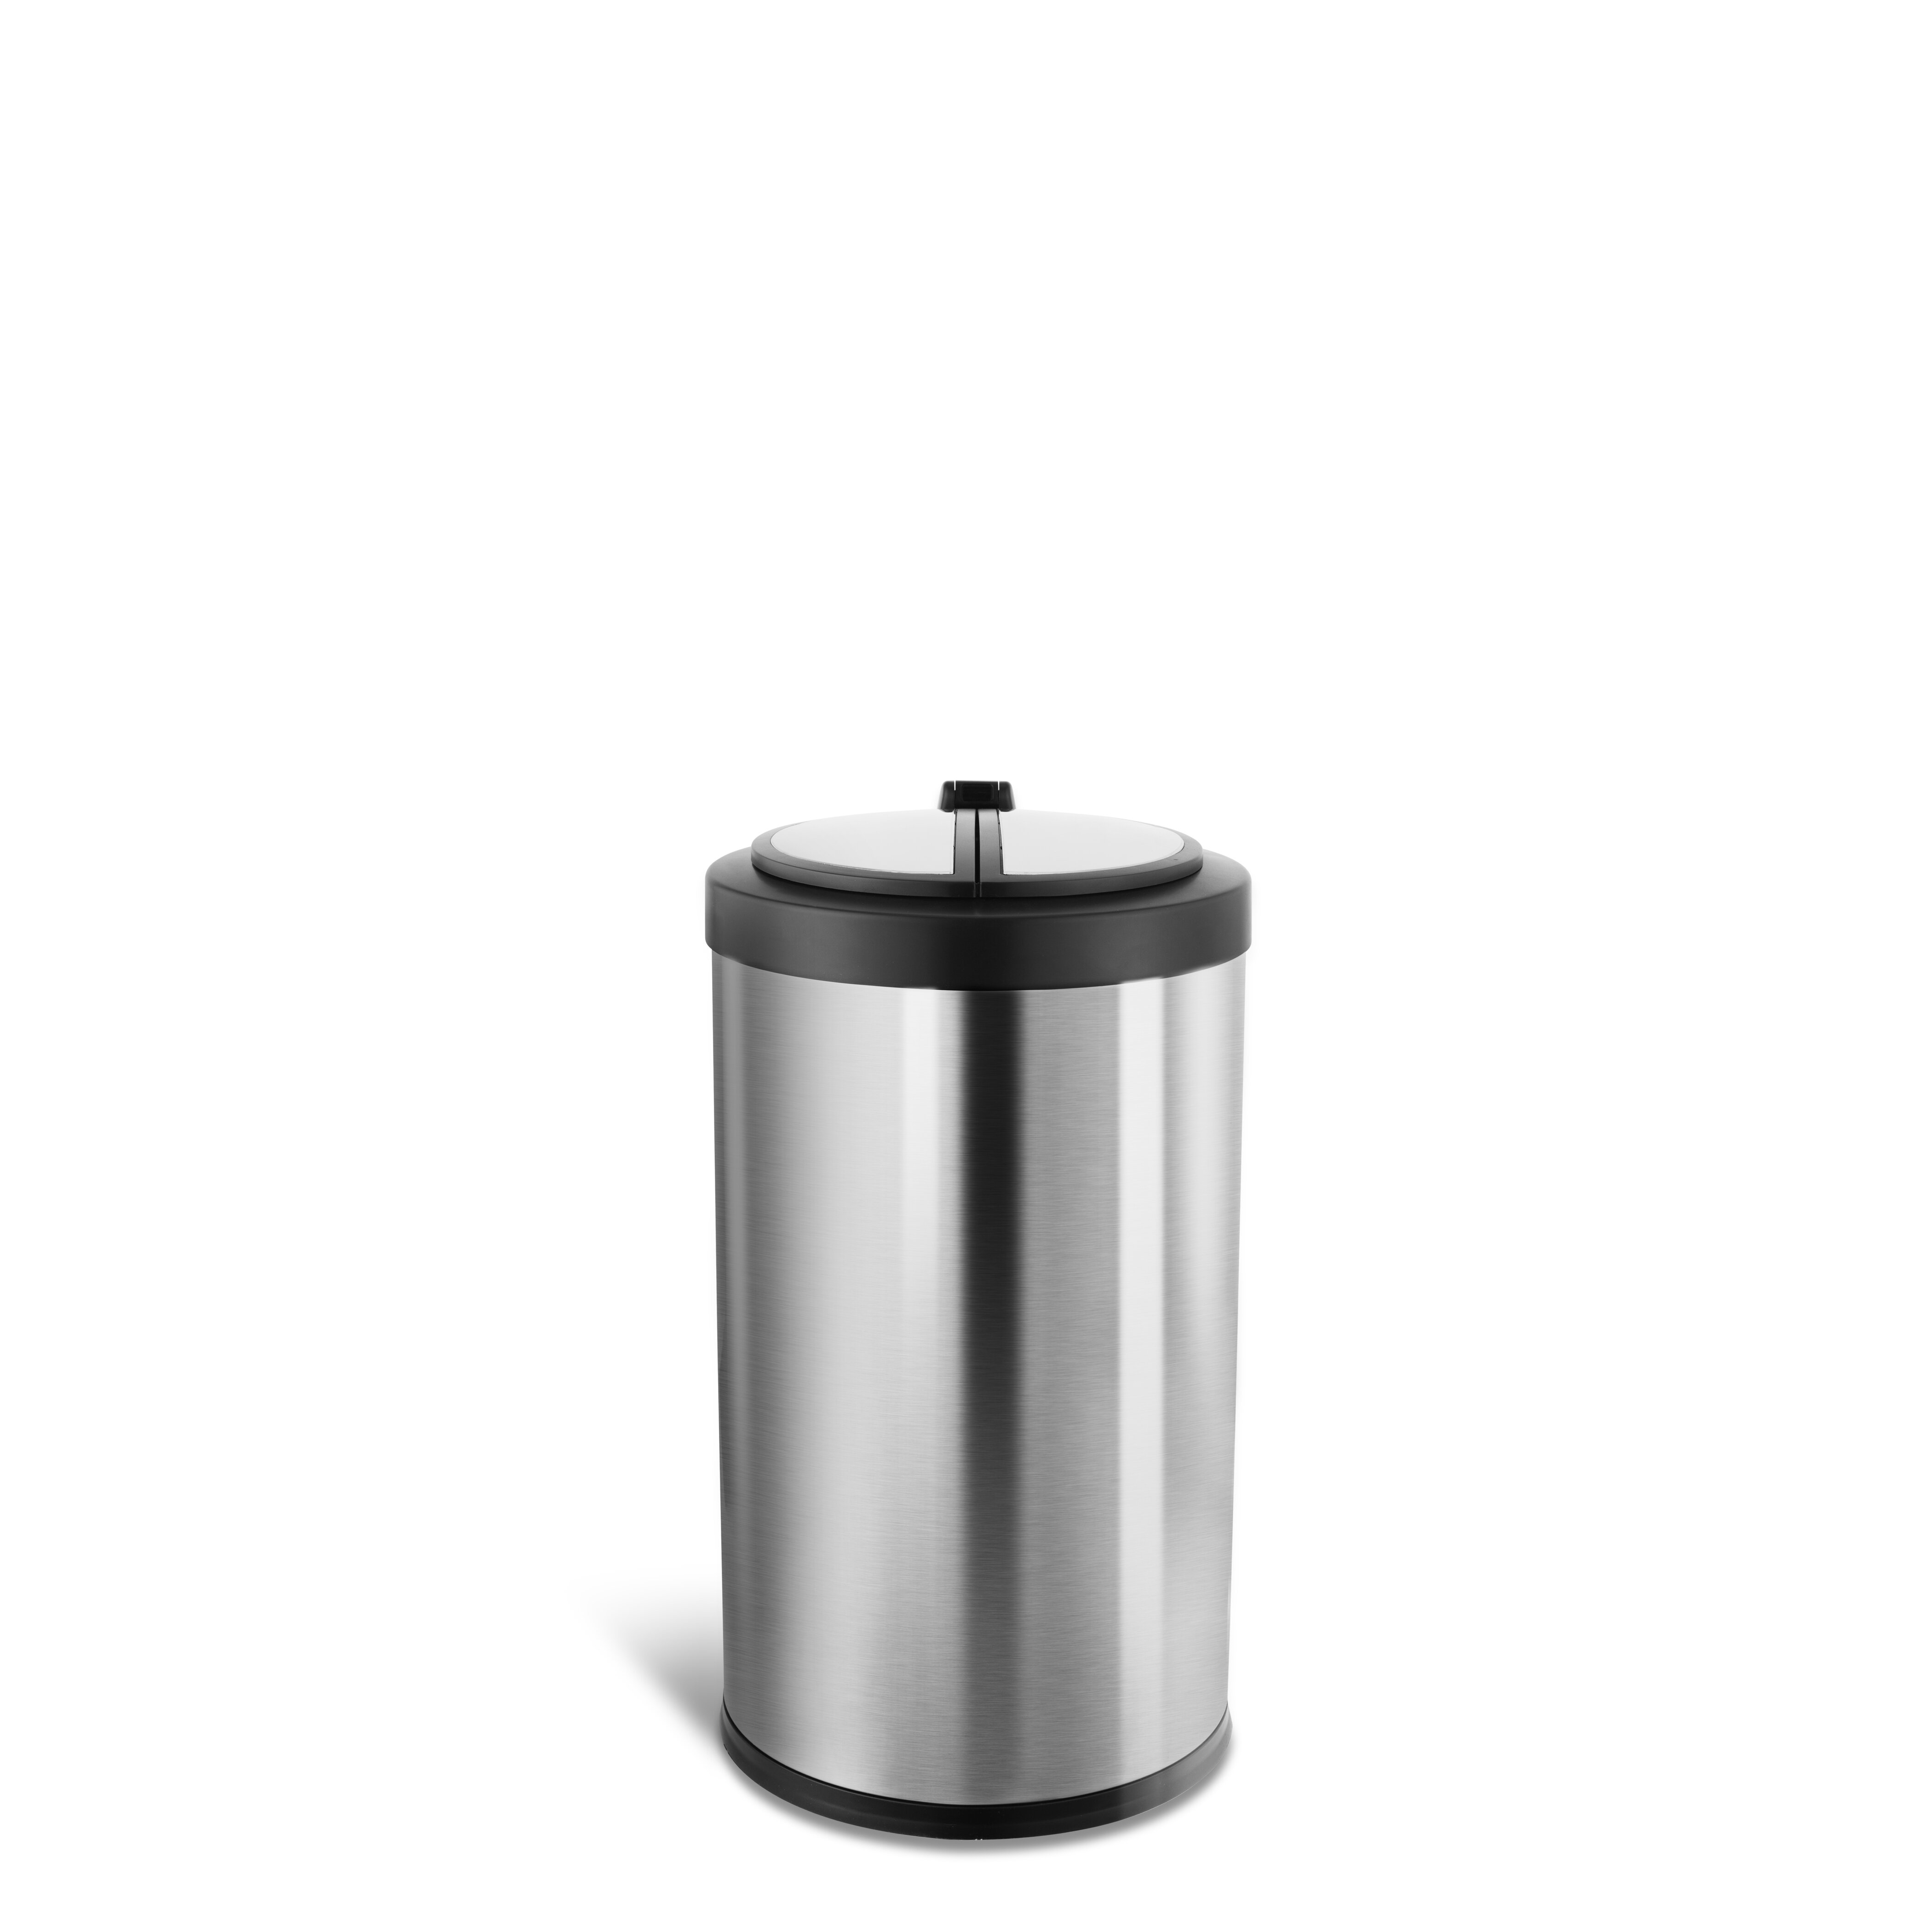 Nine Stars Stainless Steel 3 2 Gallon Motion Sensor Trash Can Reviews Wayfair